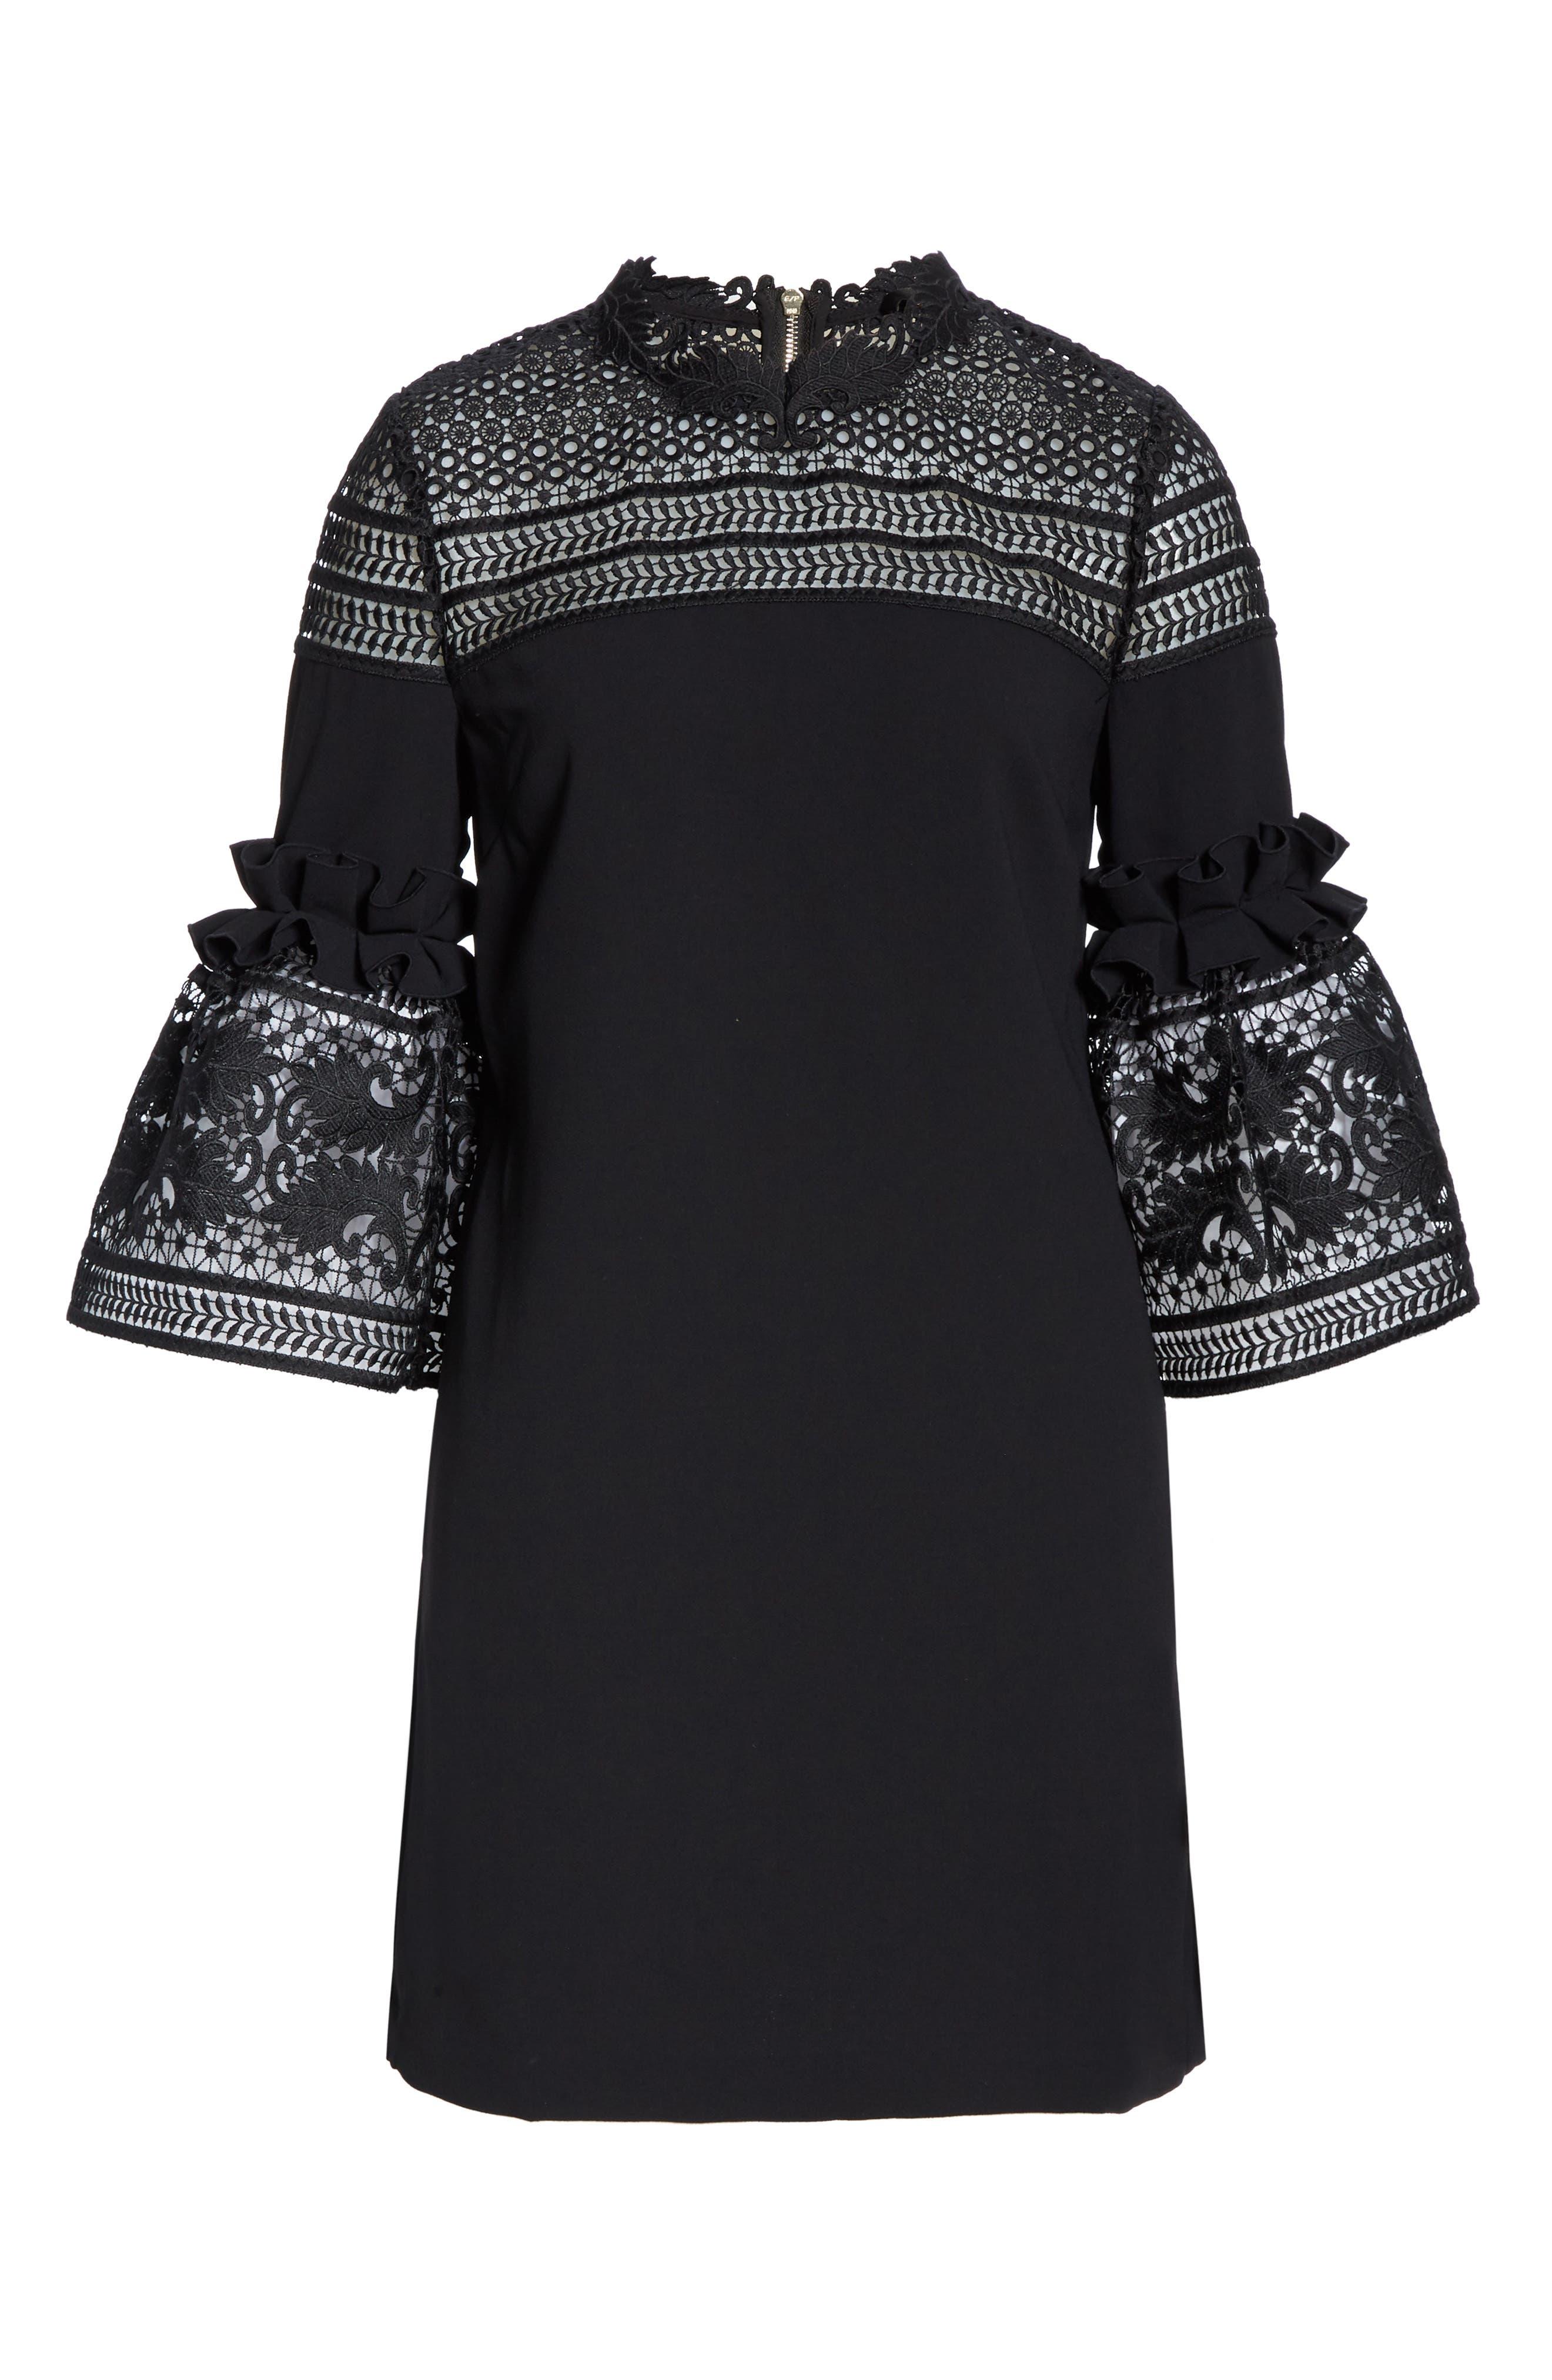 TED BAKER LONDON, Lace Panel Bell Sleeve Tunic Dress, Alternate thumbnail 7, color, BLACK